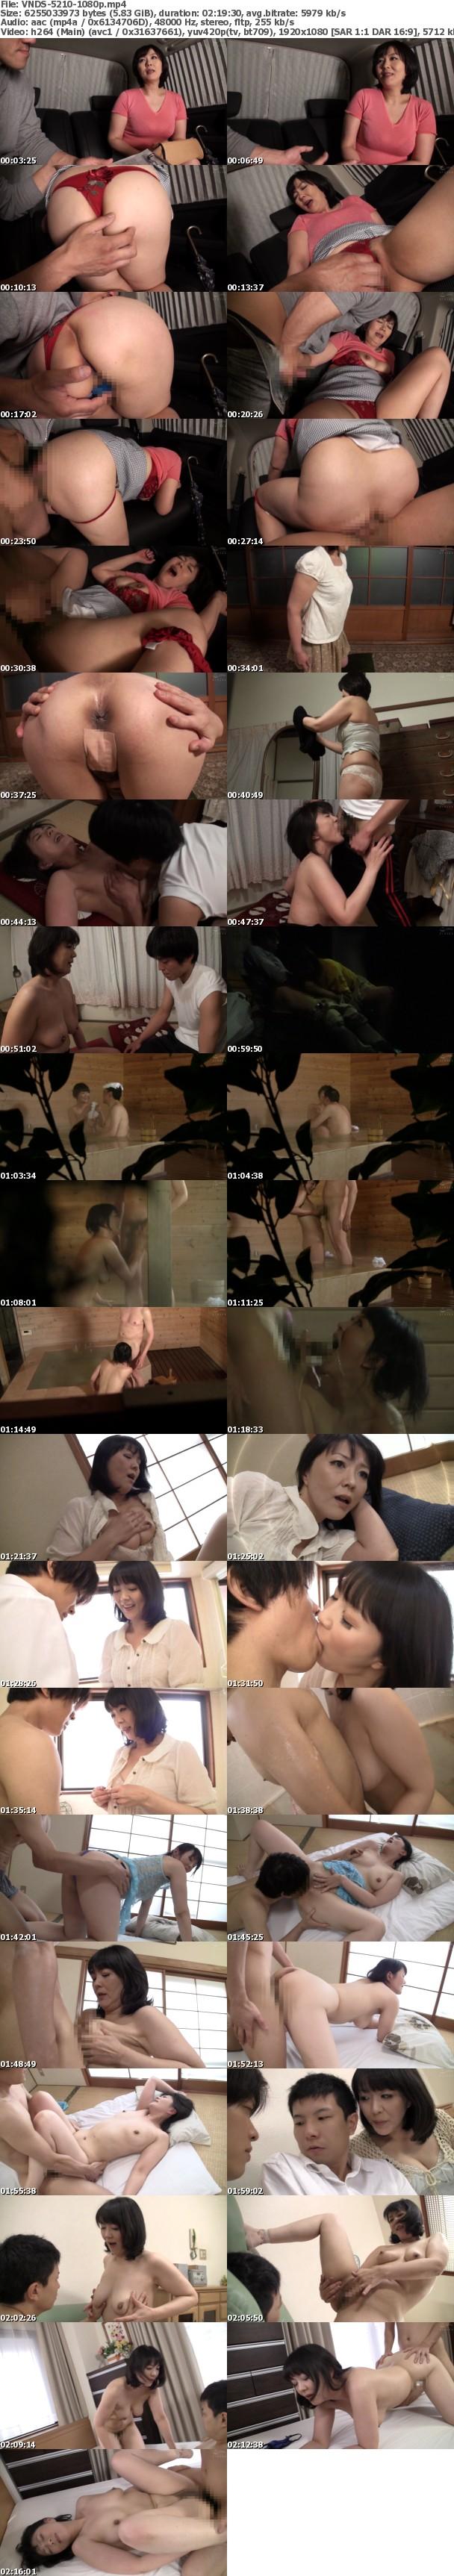 (Full HD) VNDS-5210 極上熟女 円城ひとみ 悩殺熟ボディ